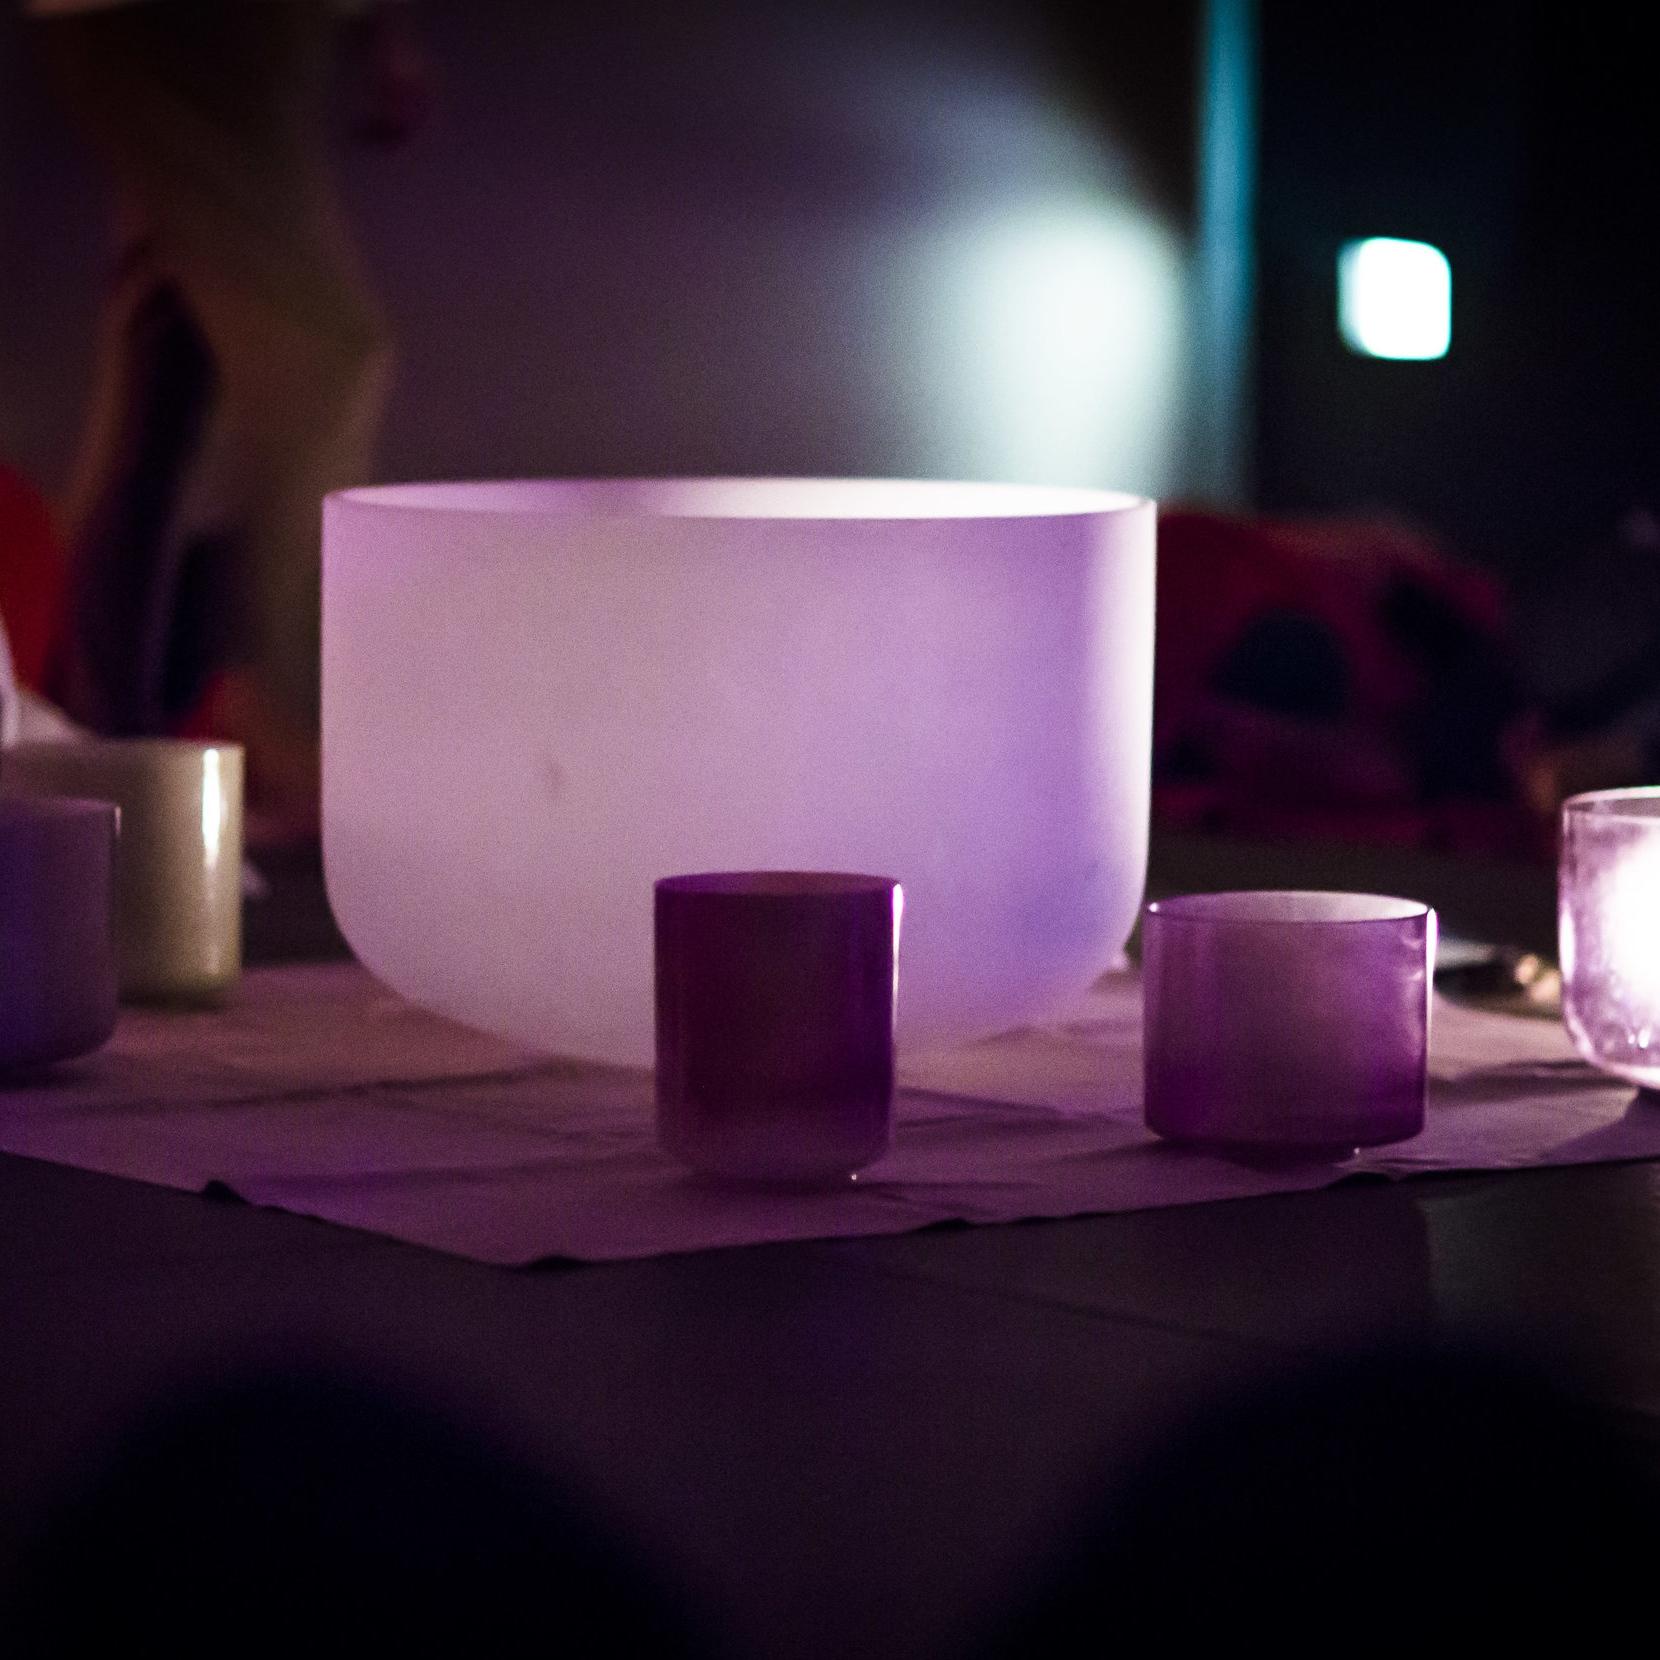 NickHopper_SoundSebastien_pink bowls in the dark.jpg